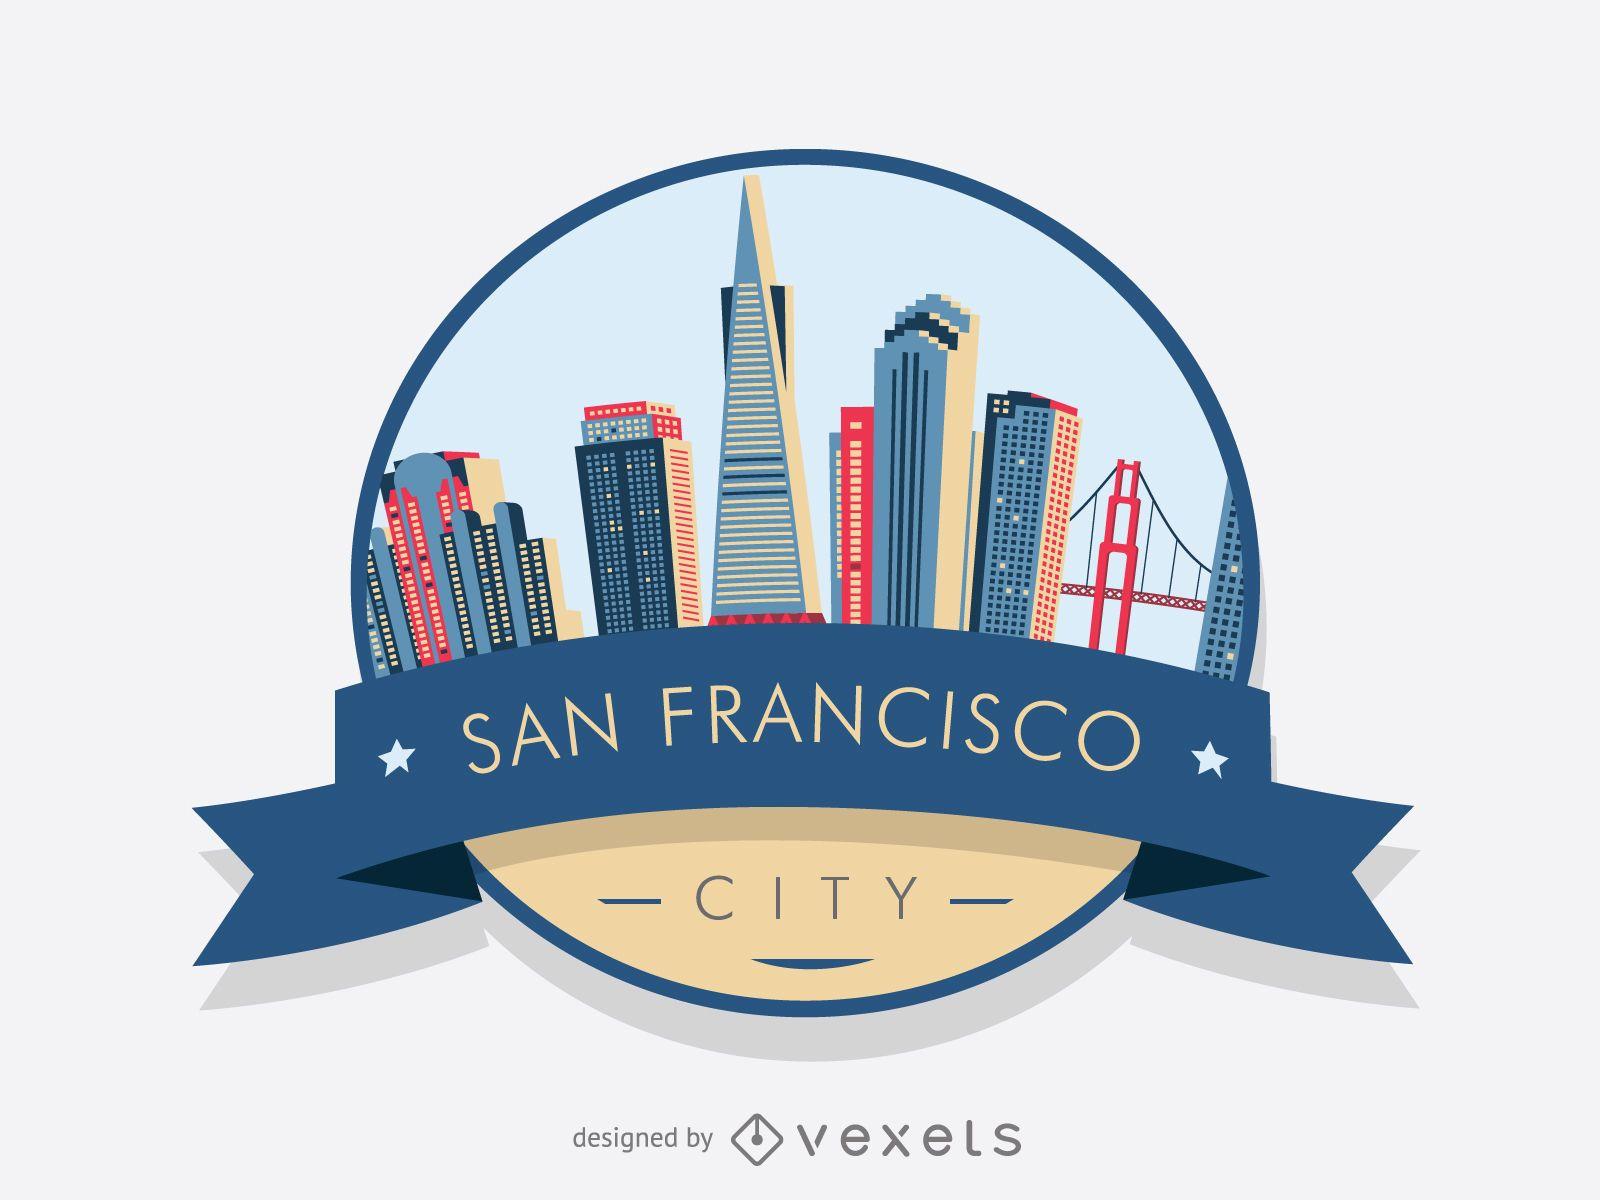 San Francisco Badge Skyline Vector Download